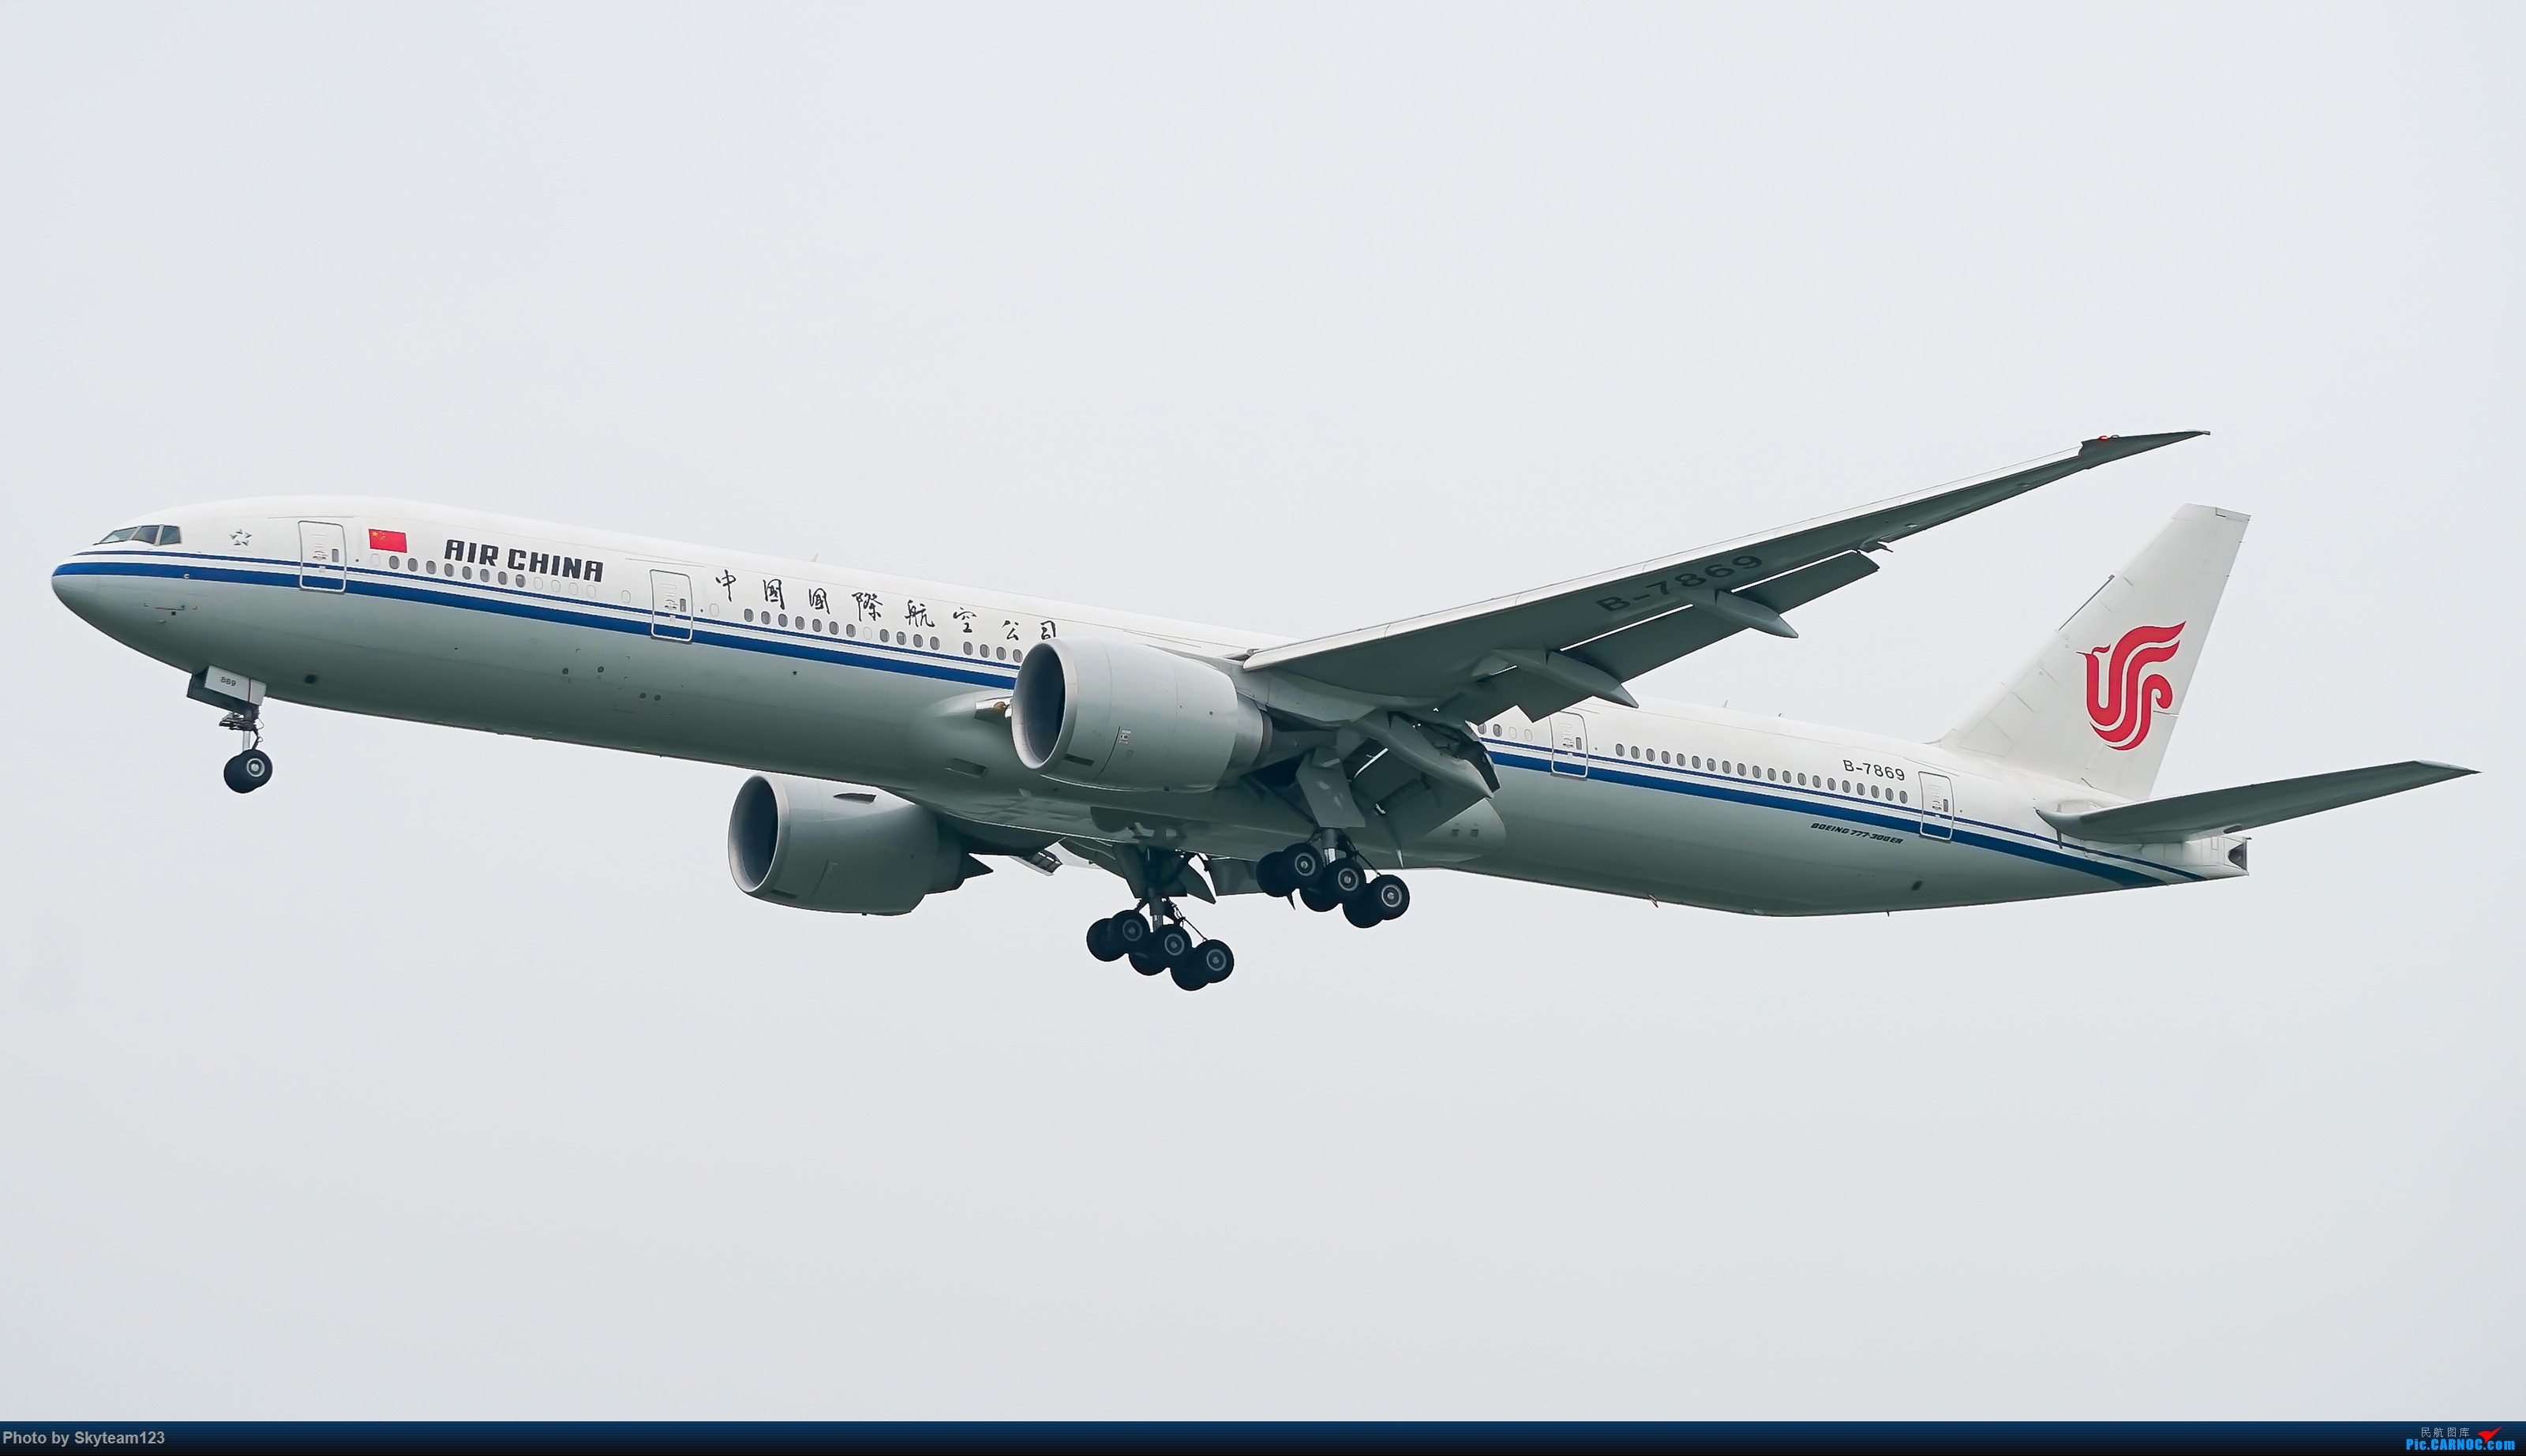 Re:《Simon游记》第六季第八集 CZ3101&CZ3000 南航全新波音78W经济舱体验&详细测评 PEK八卦台烂天拍机 及回程A388上层公务舱记录 BOEING 777-300ER B-7869 中国北京首都国际机场